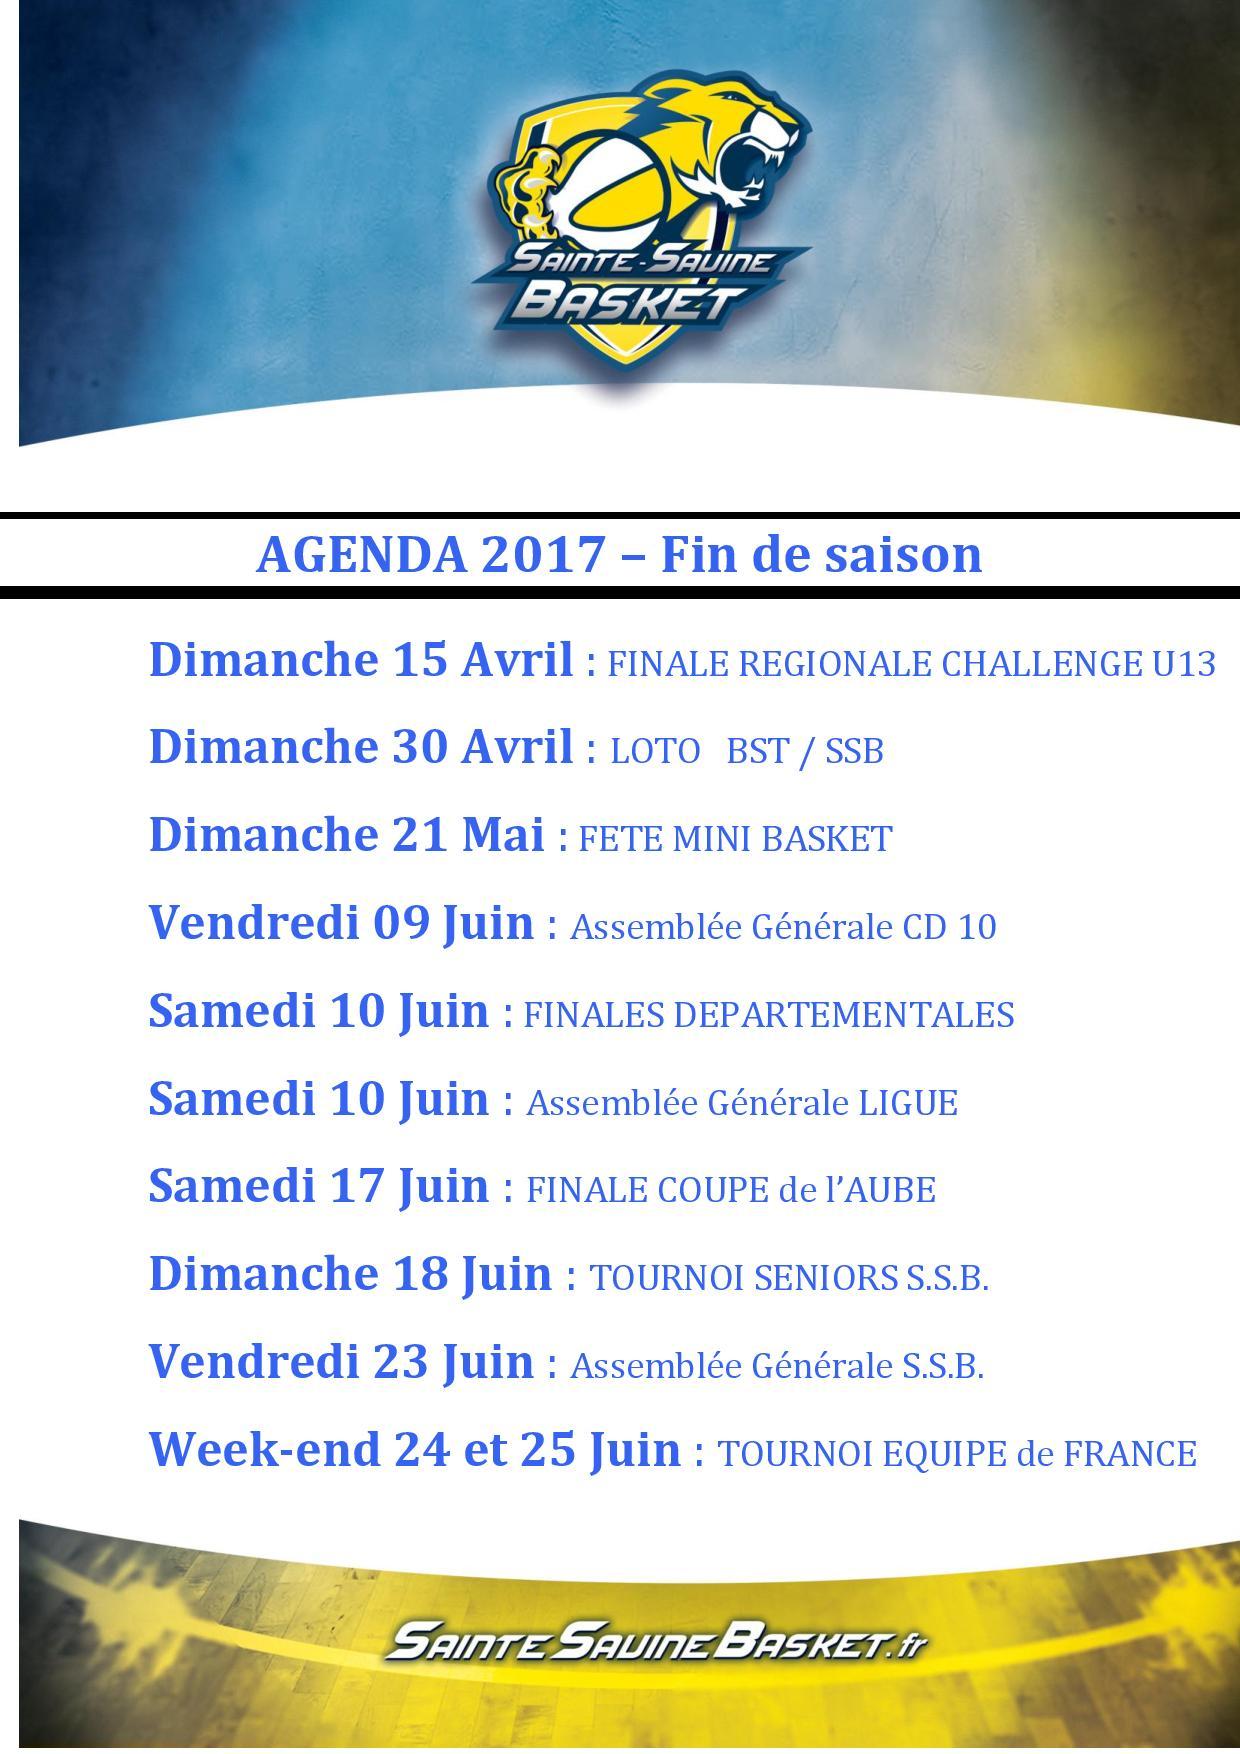 Agenda SSB - Fin de saison-page-001